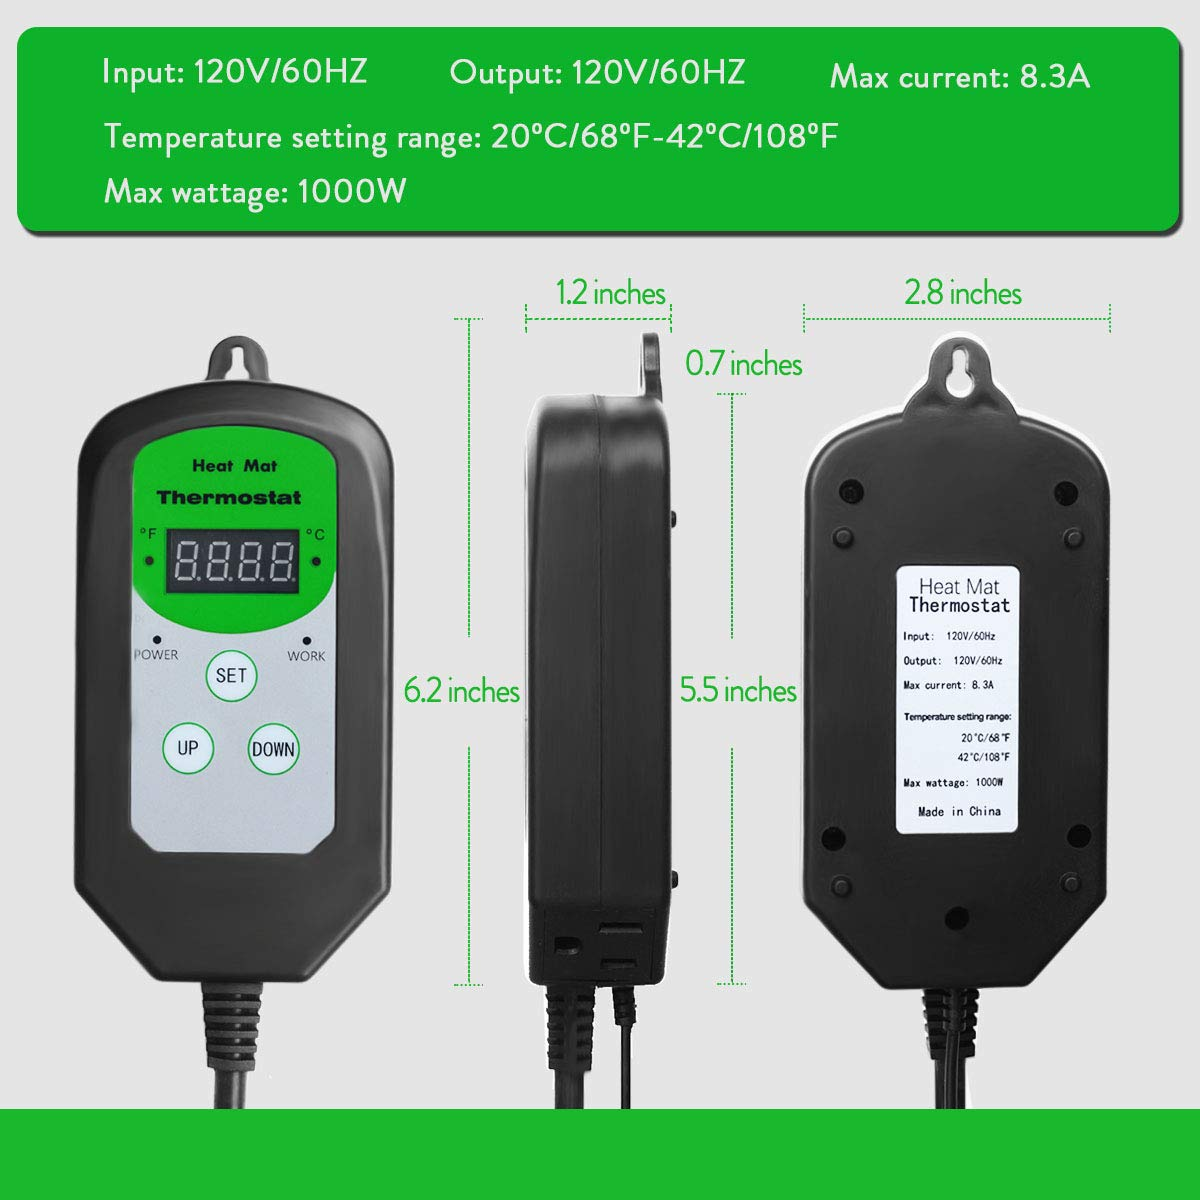 Amazon.com: Termostato termostato termostato termostato ...